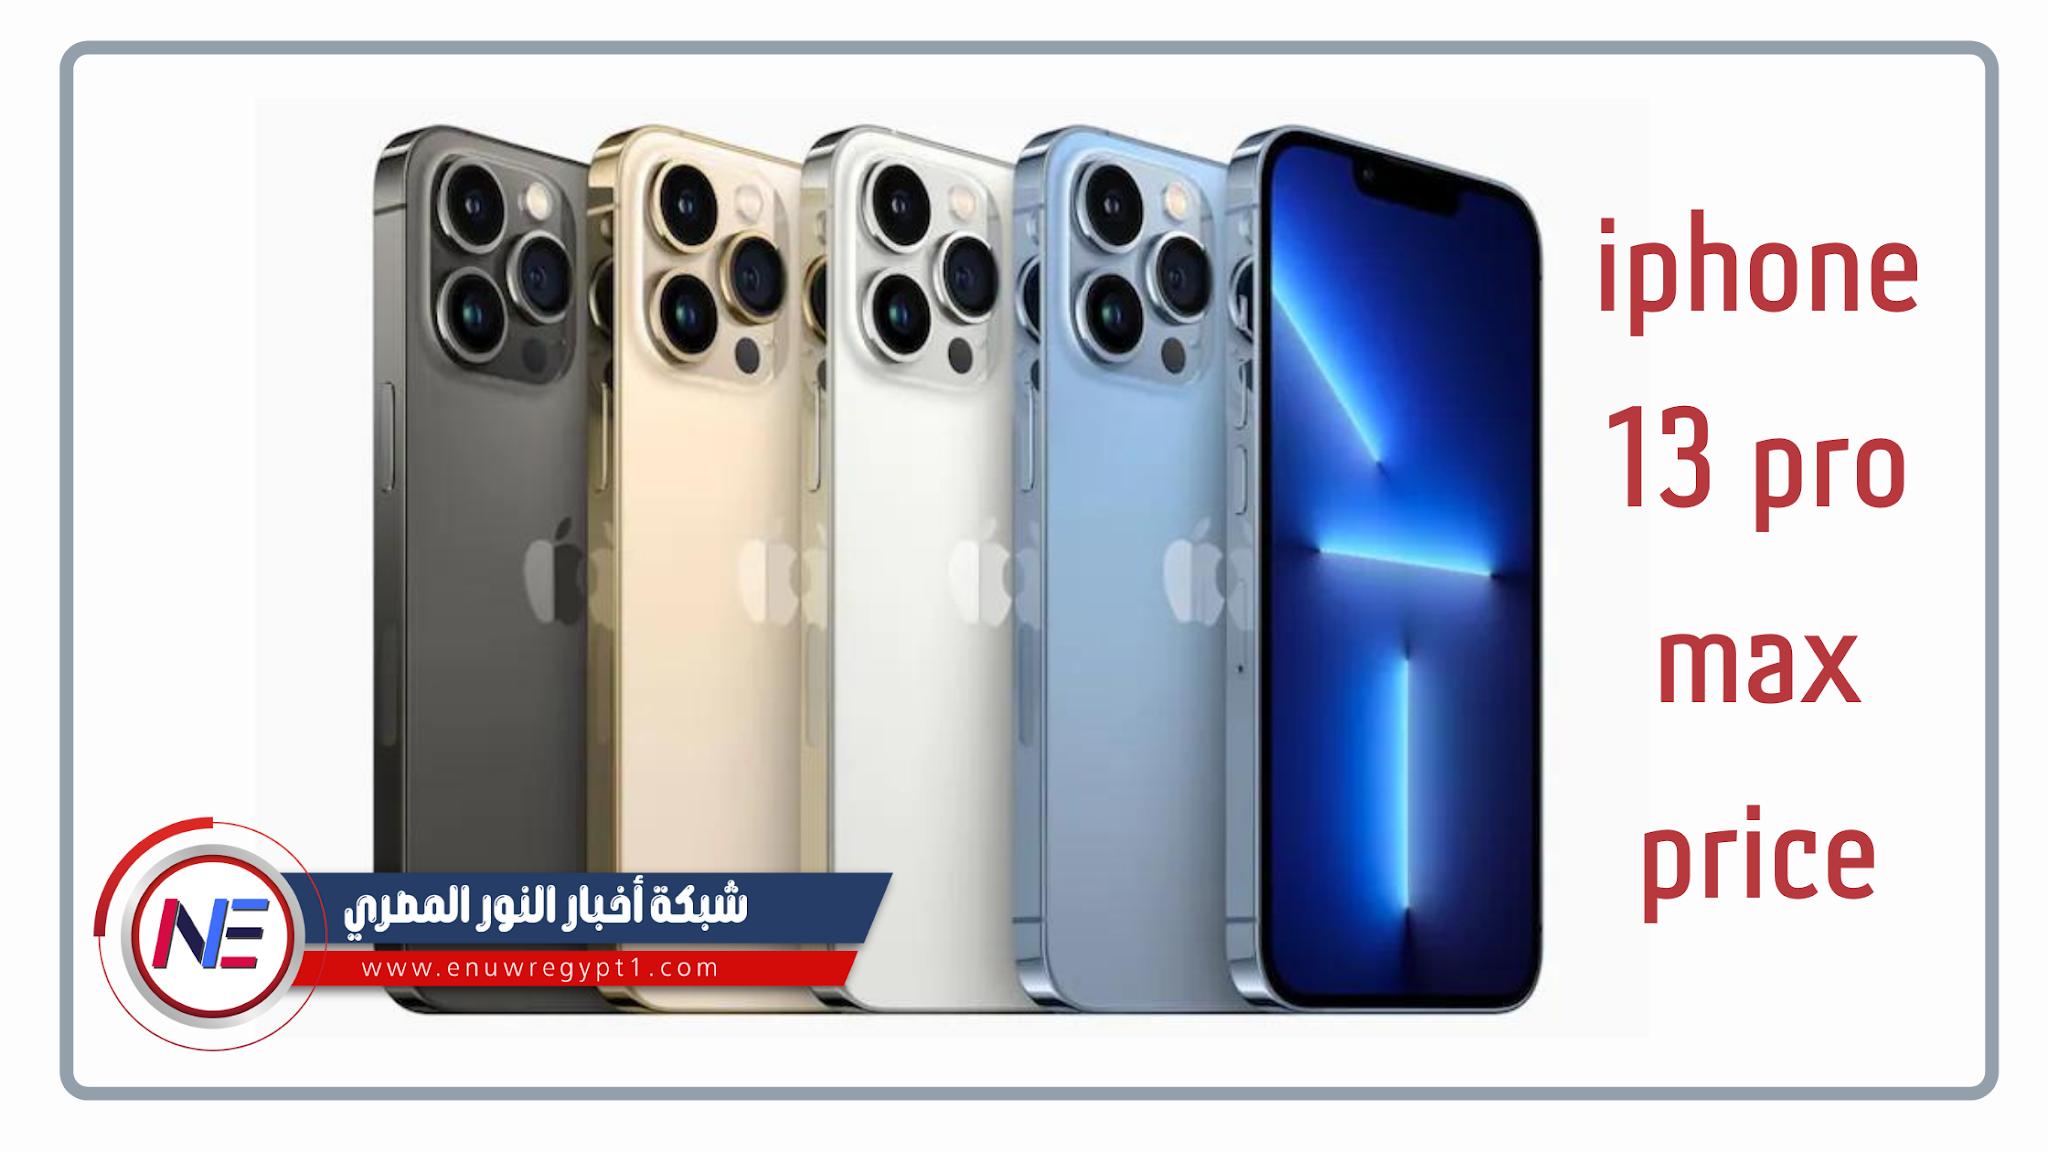 وصل الان ايفون 13 برو ماكس الخارق   تعرف على سعر ايفون 13 برو iphone13 pro max price